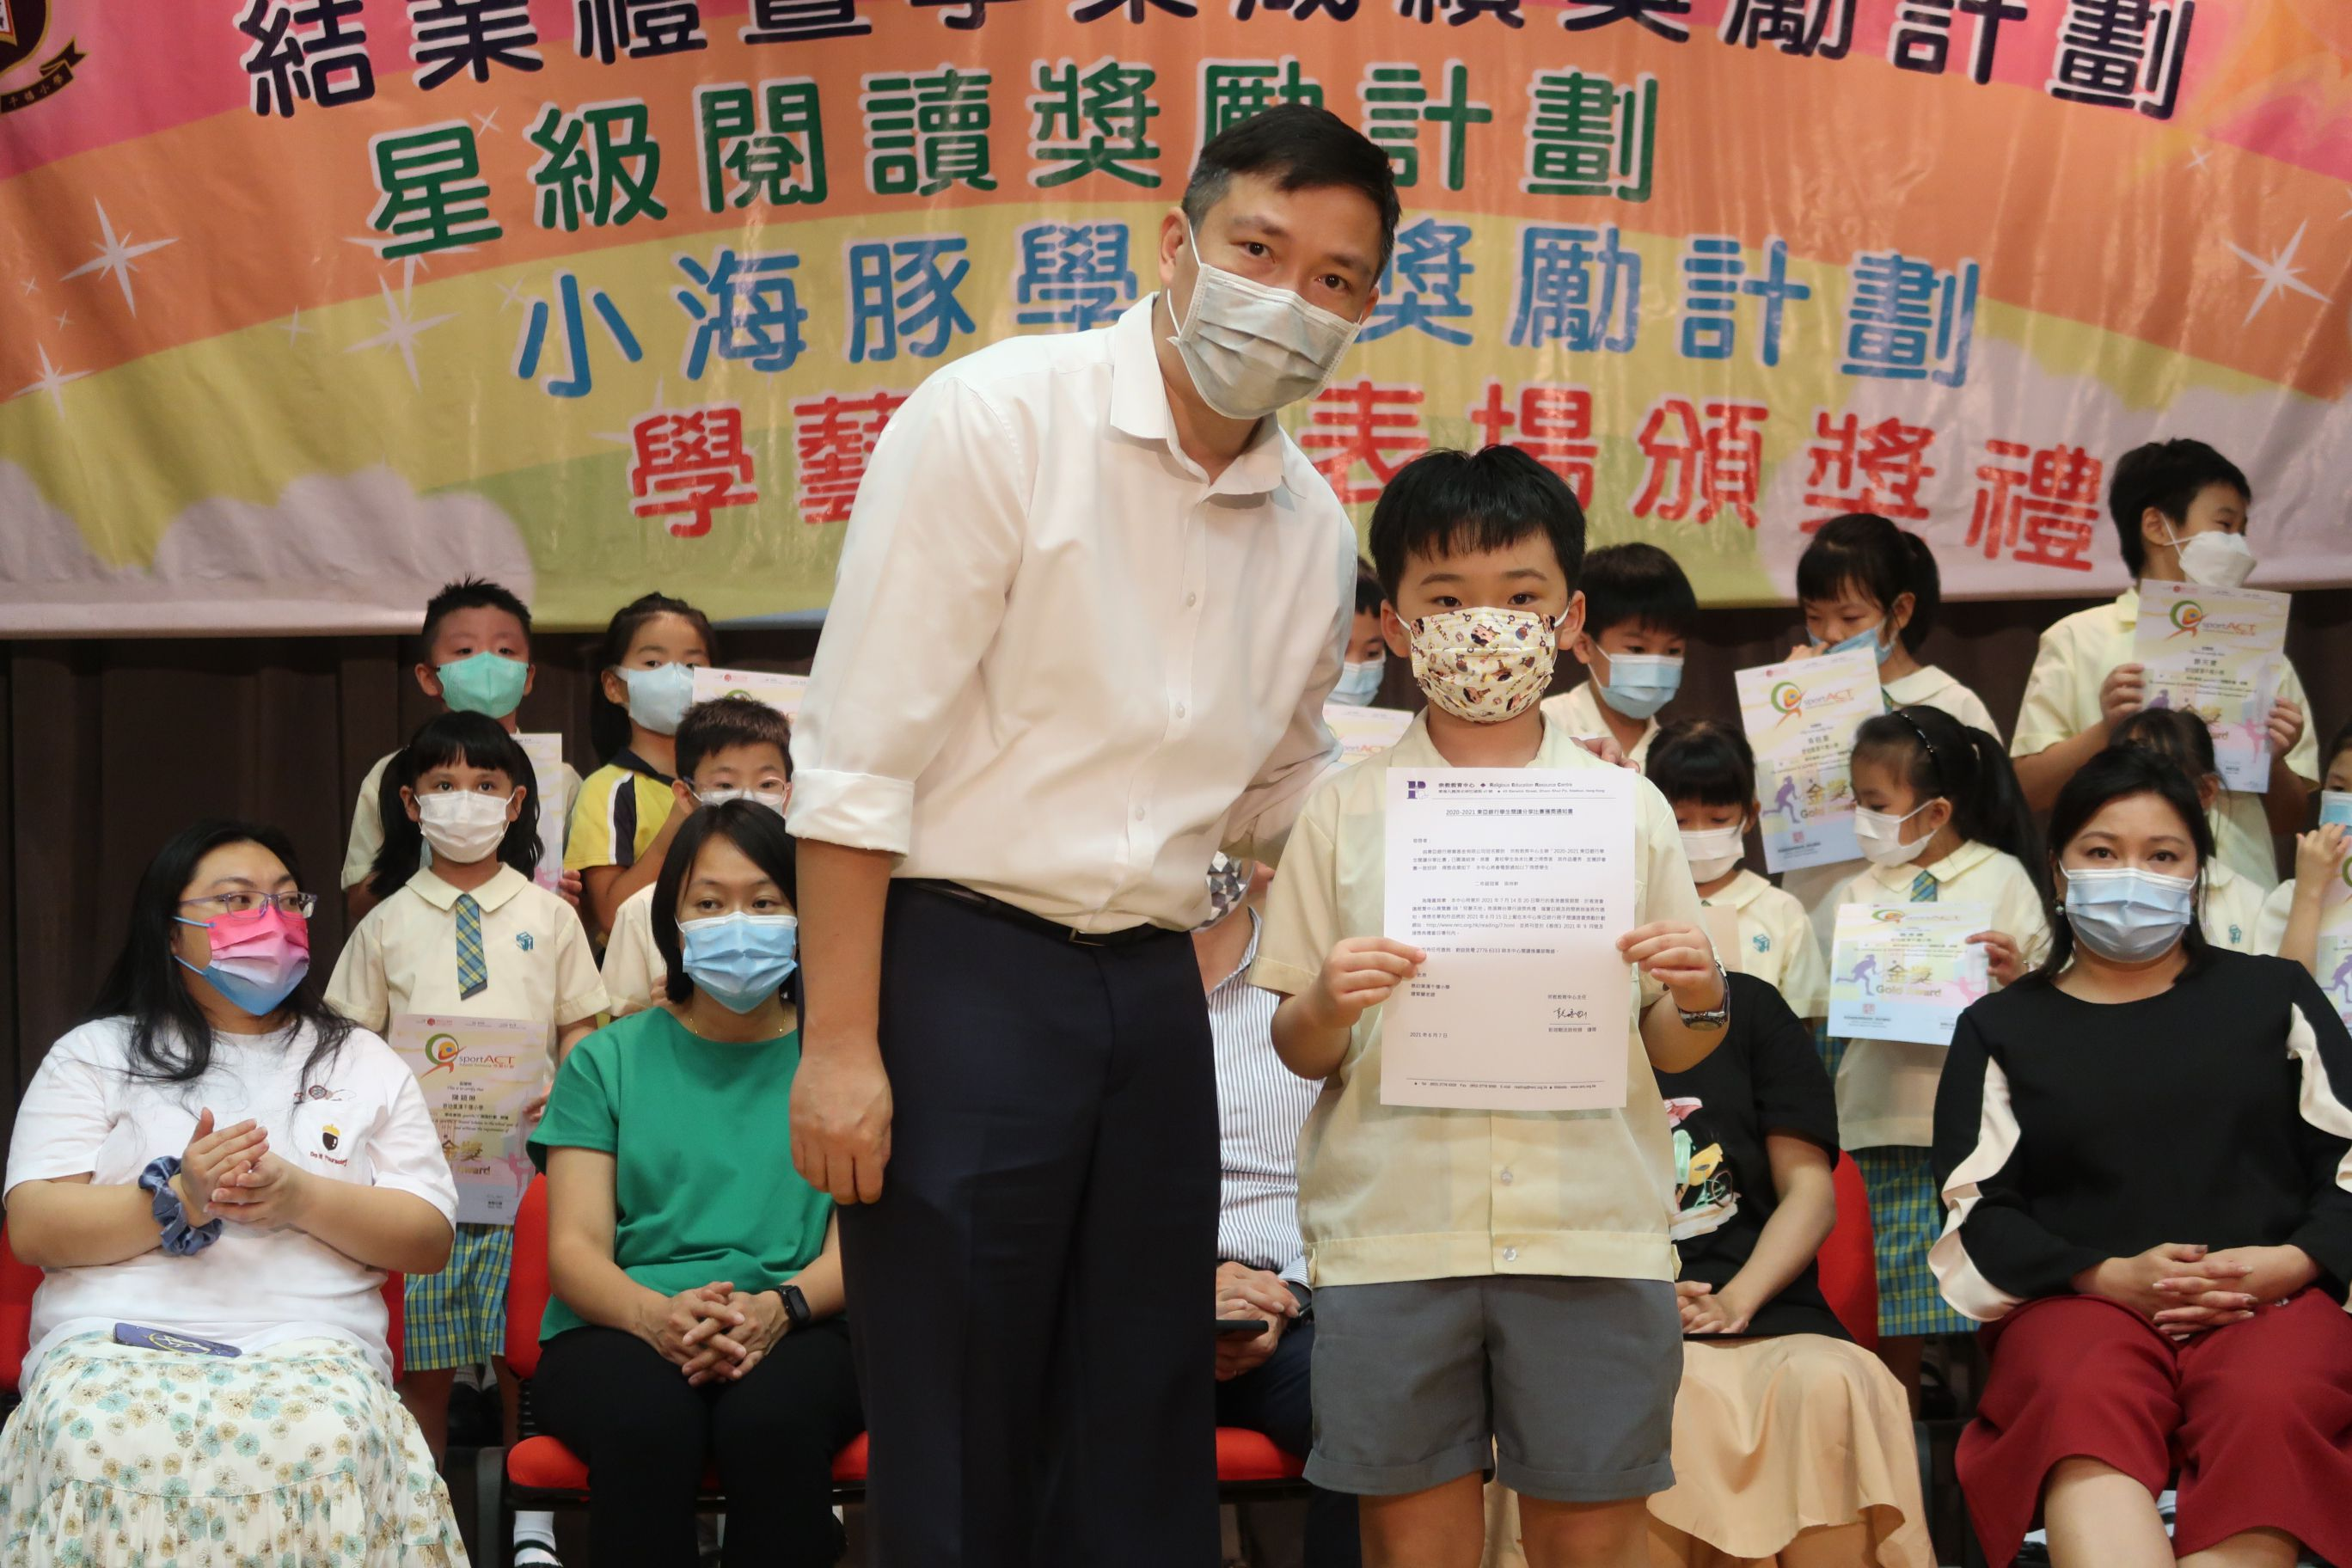 https://syh.edu.hk/sites/default/files/img_5911.jpg